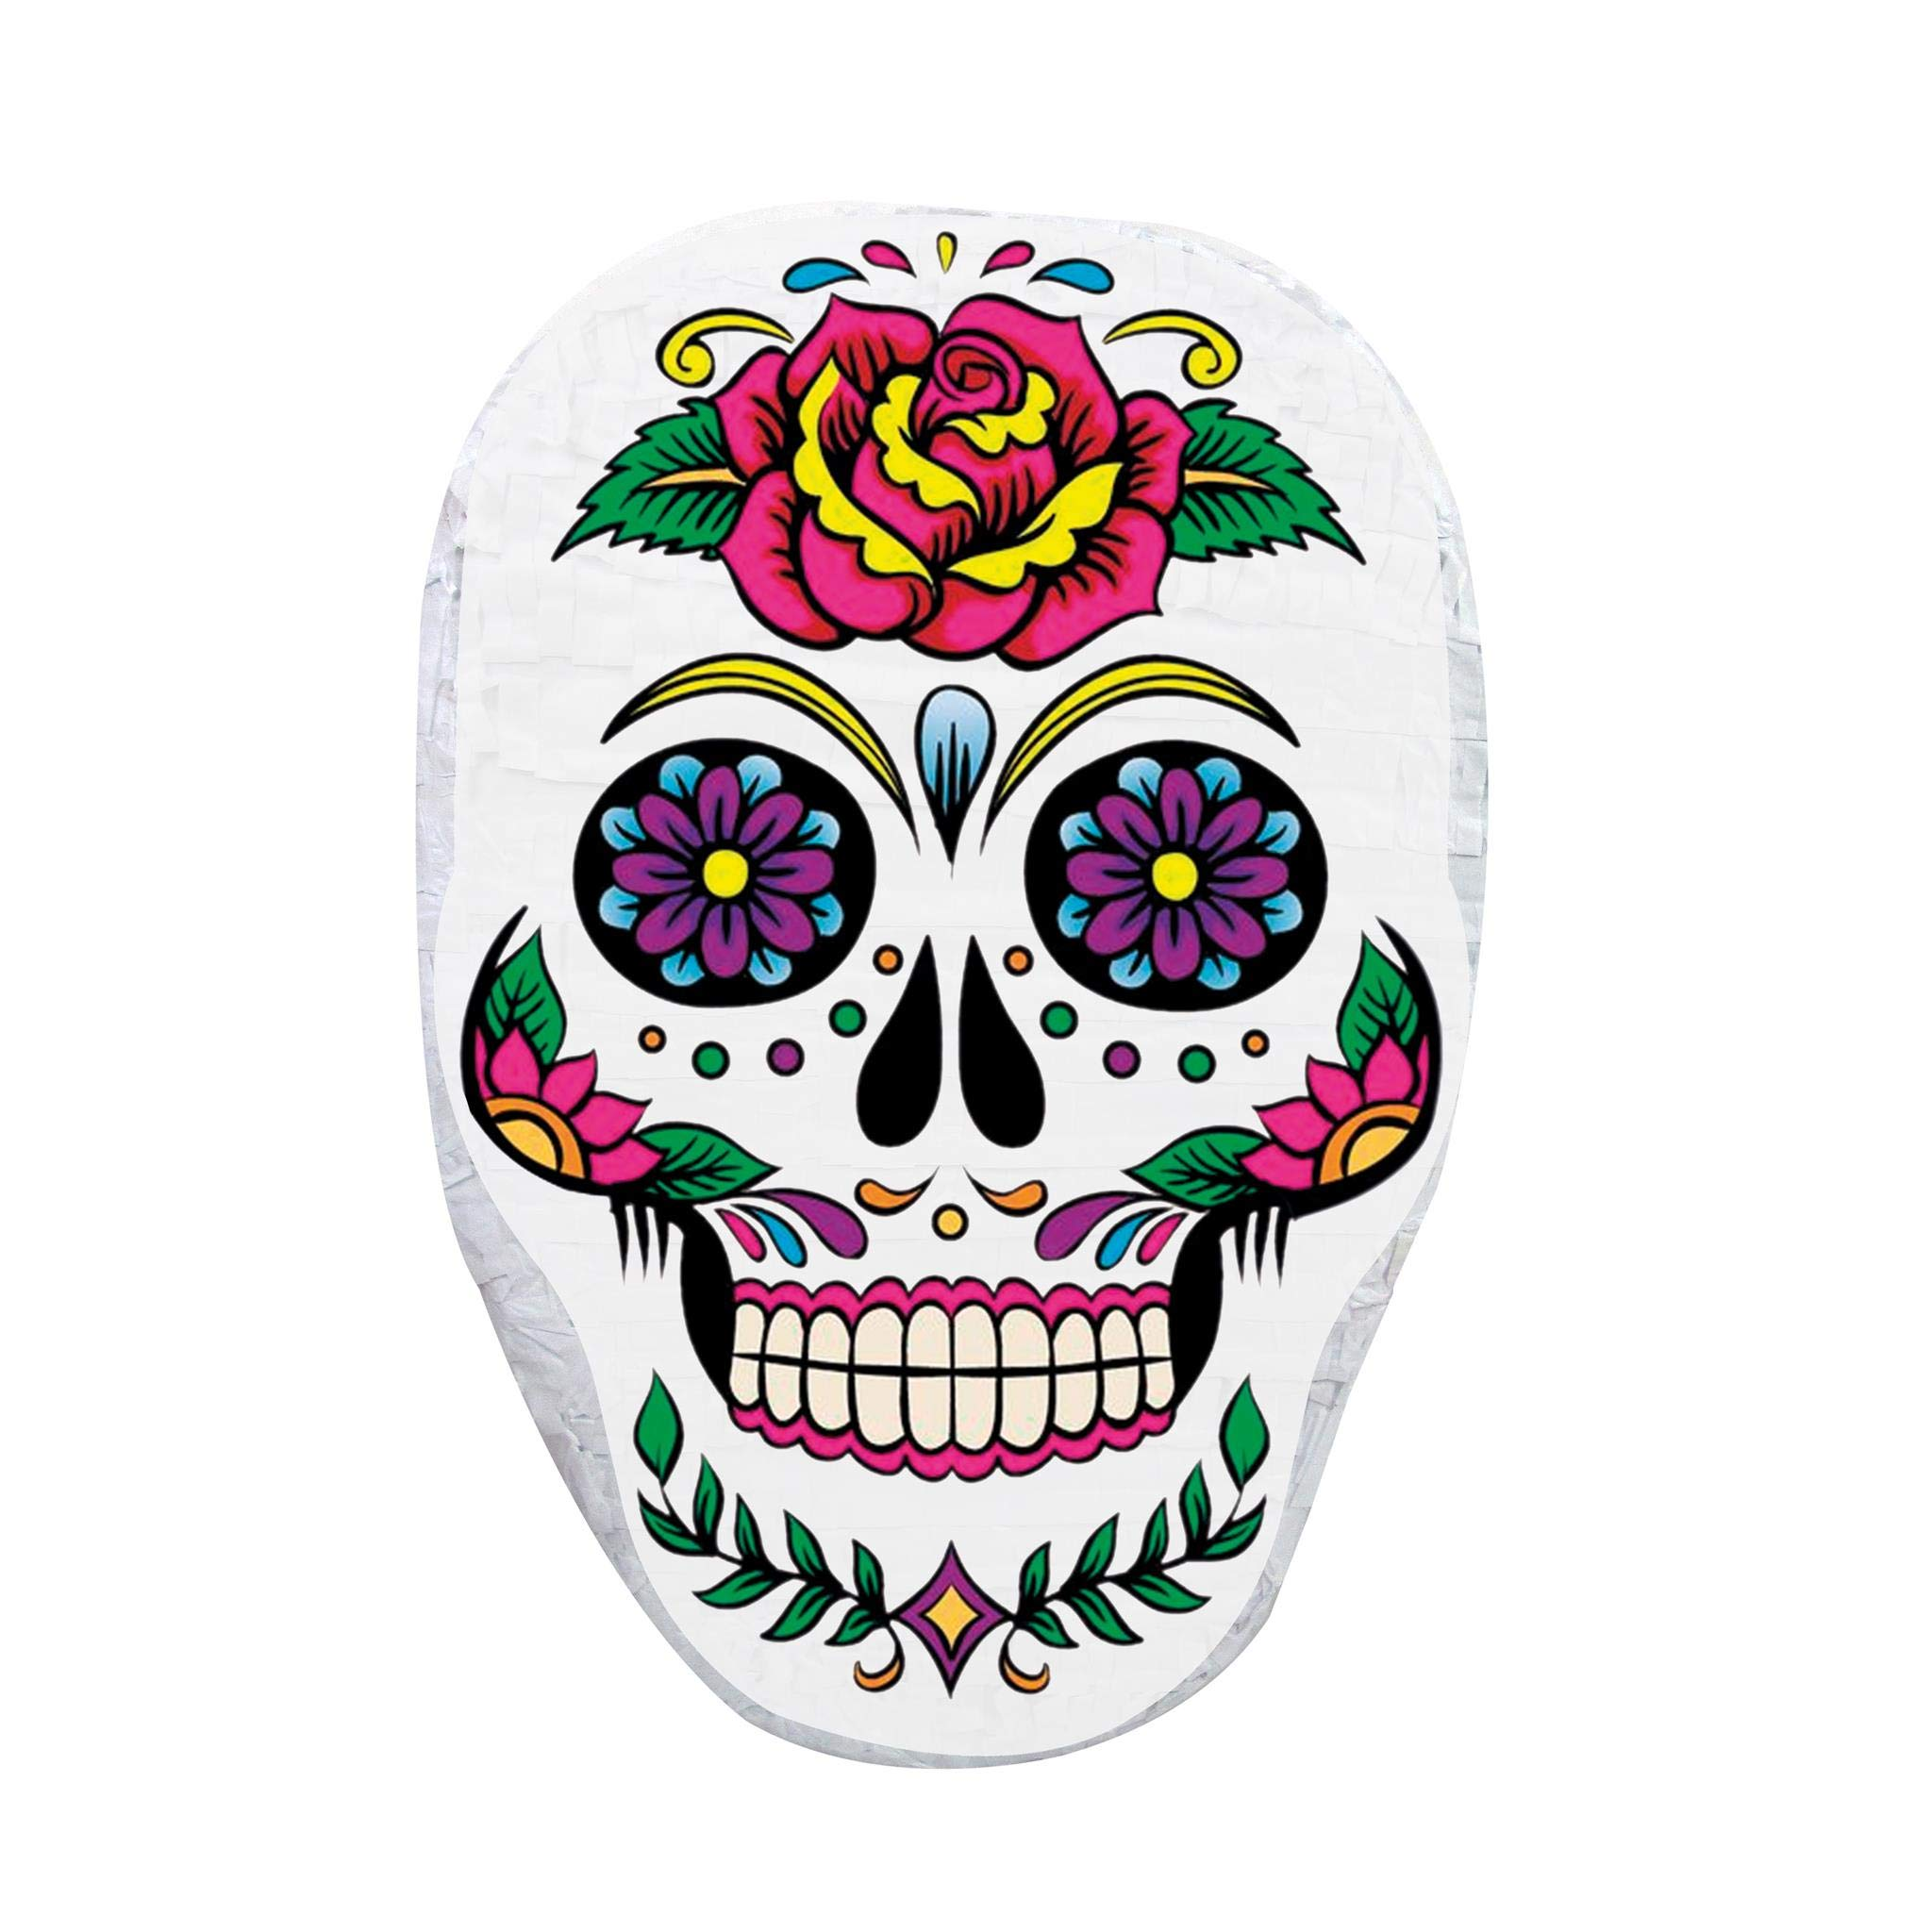 Pinatas Day of the Dead Sugar Skull Halloween Pinata, Decoration, Party Game and Photo Prop by Pinatas